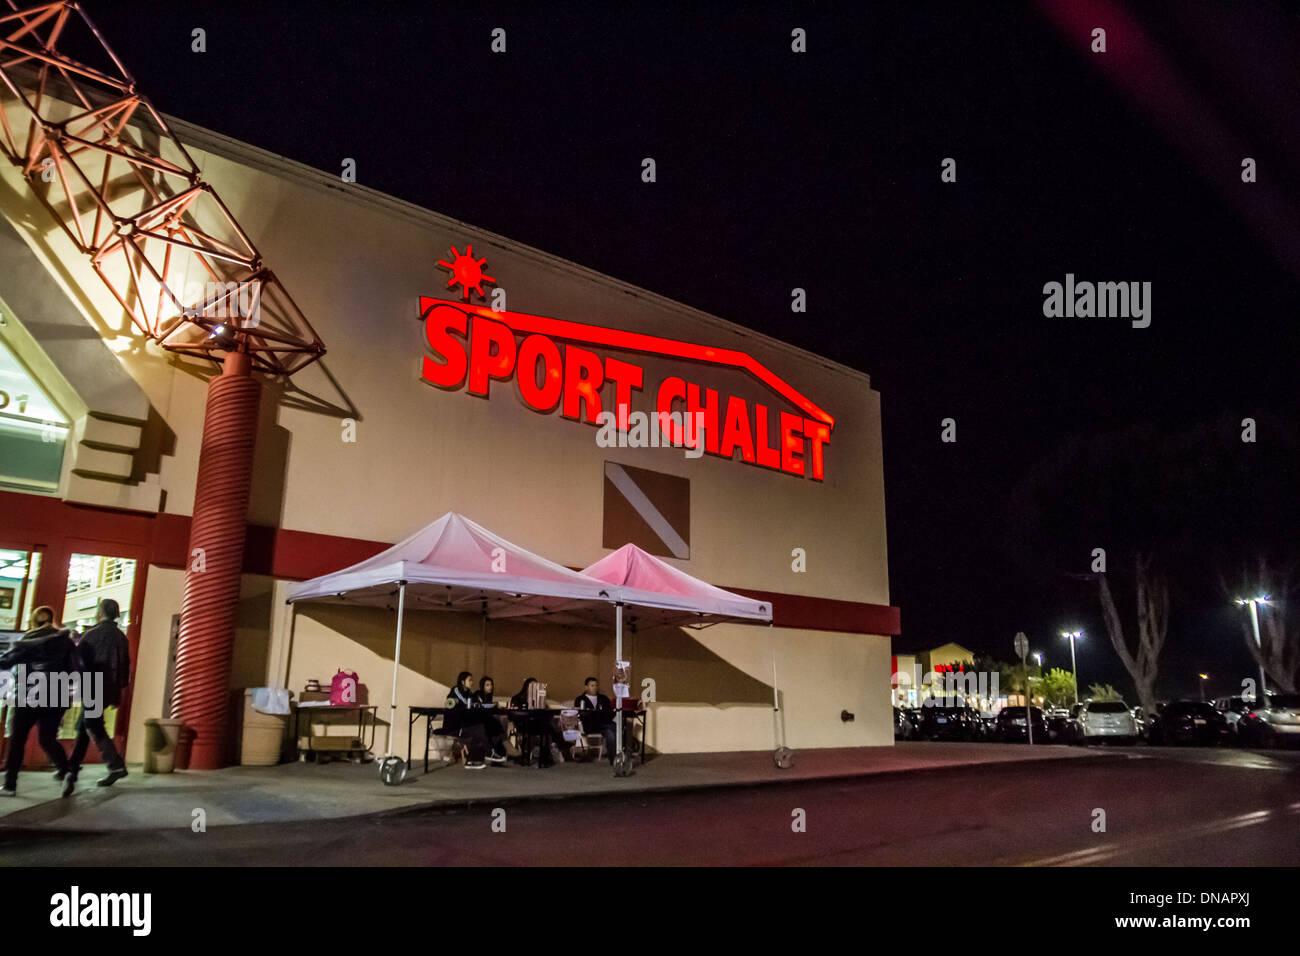 Sporting Goods Store Stock Photos & Sporting Goods Store Stock ...